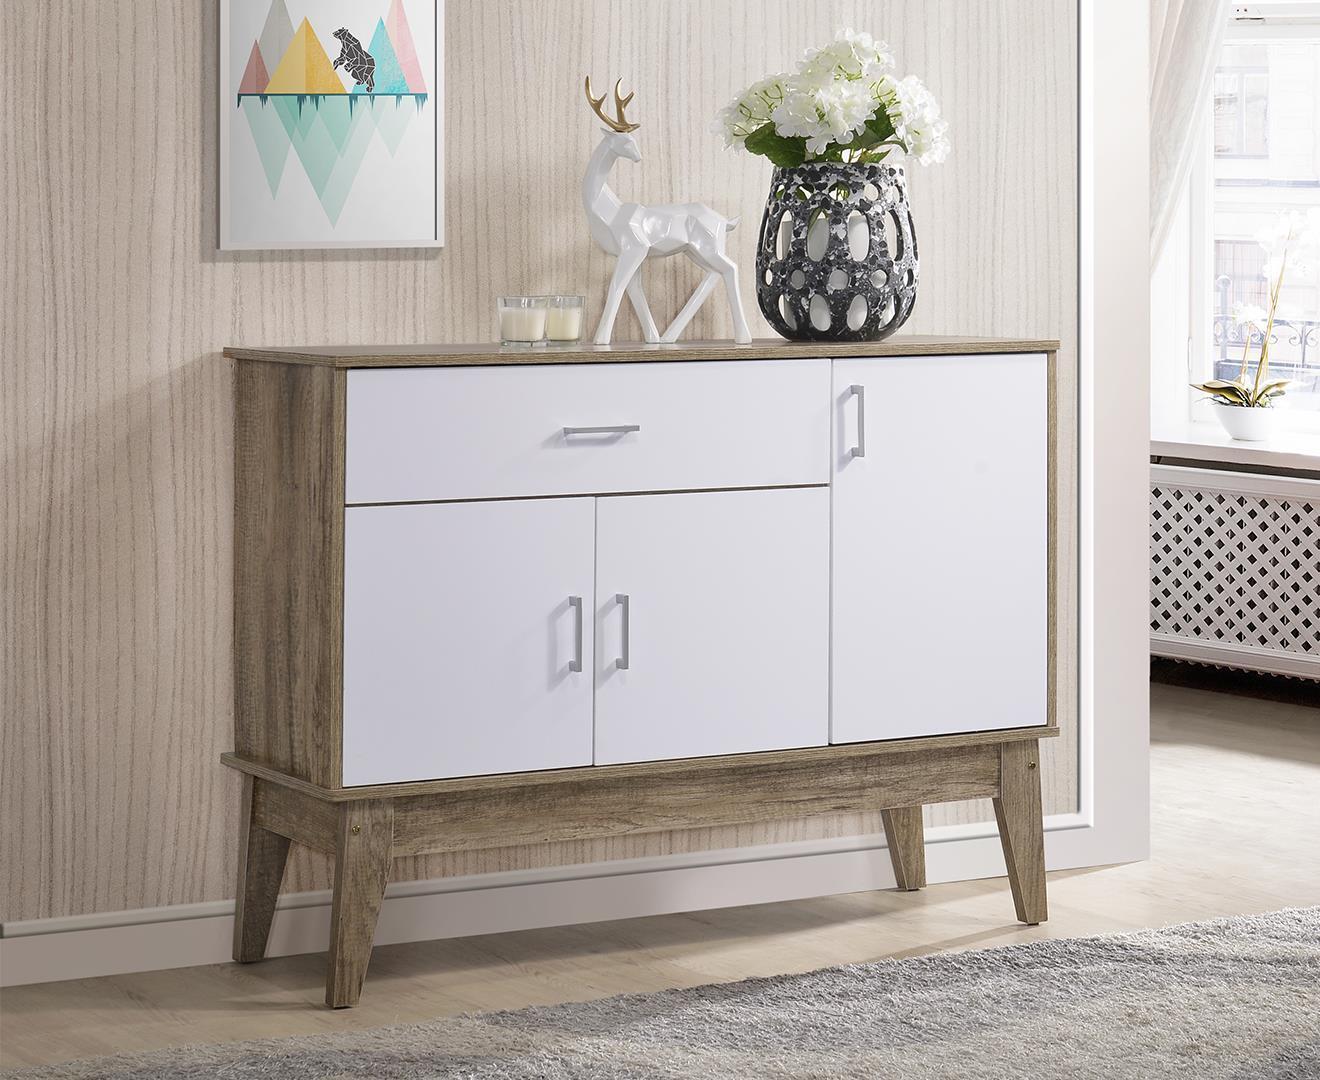 Scandinavian Large Shoe Cabinet(Free Installation + Delivery) Rack Storage Entryway Drawer Shelf⭐ E-LIVING Furniture